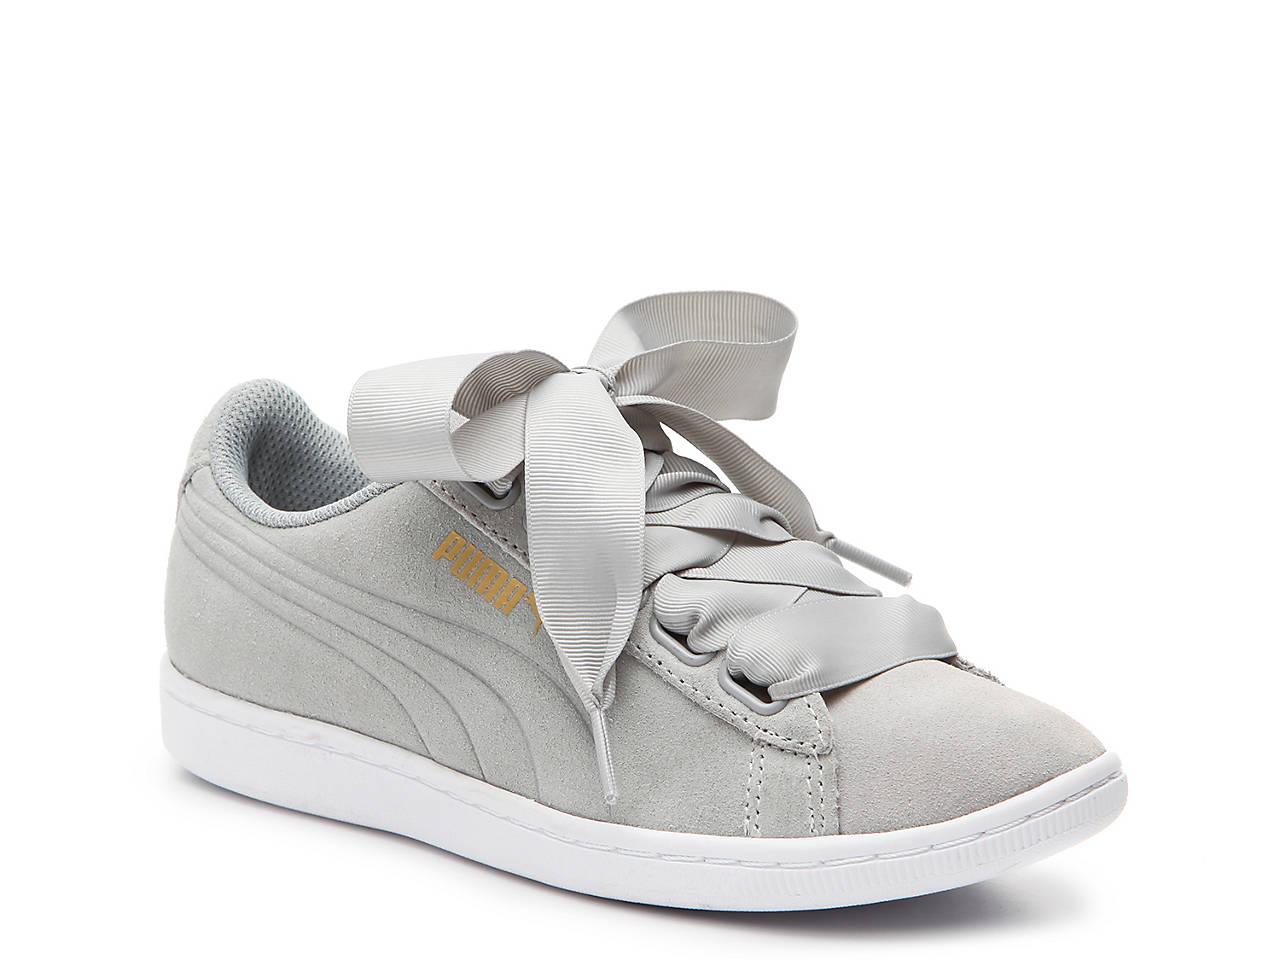 Puma Vikky Ribbon Sneaker - Women s Women s Shoes  e02c9de0a